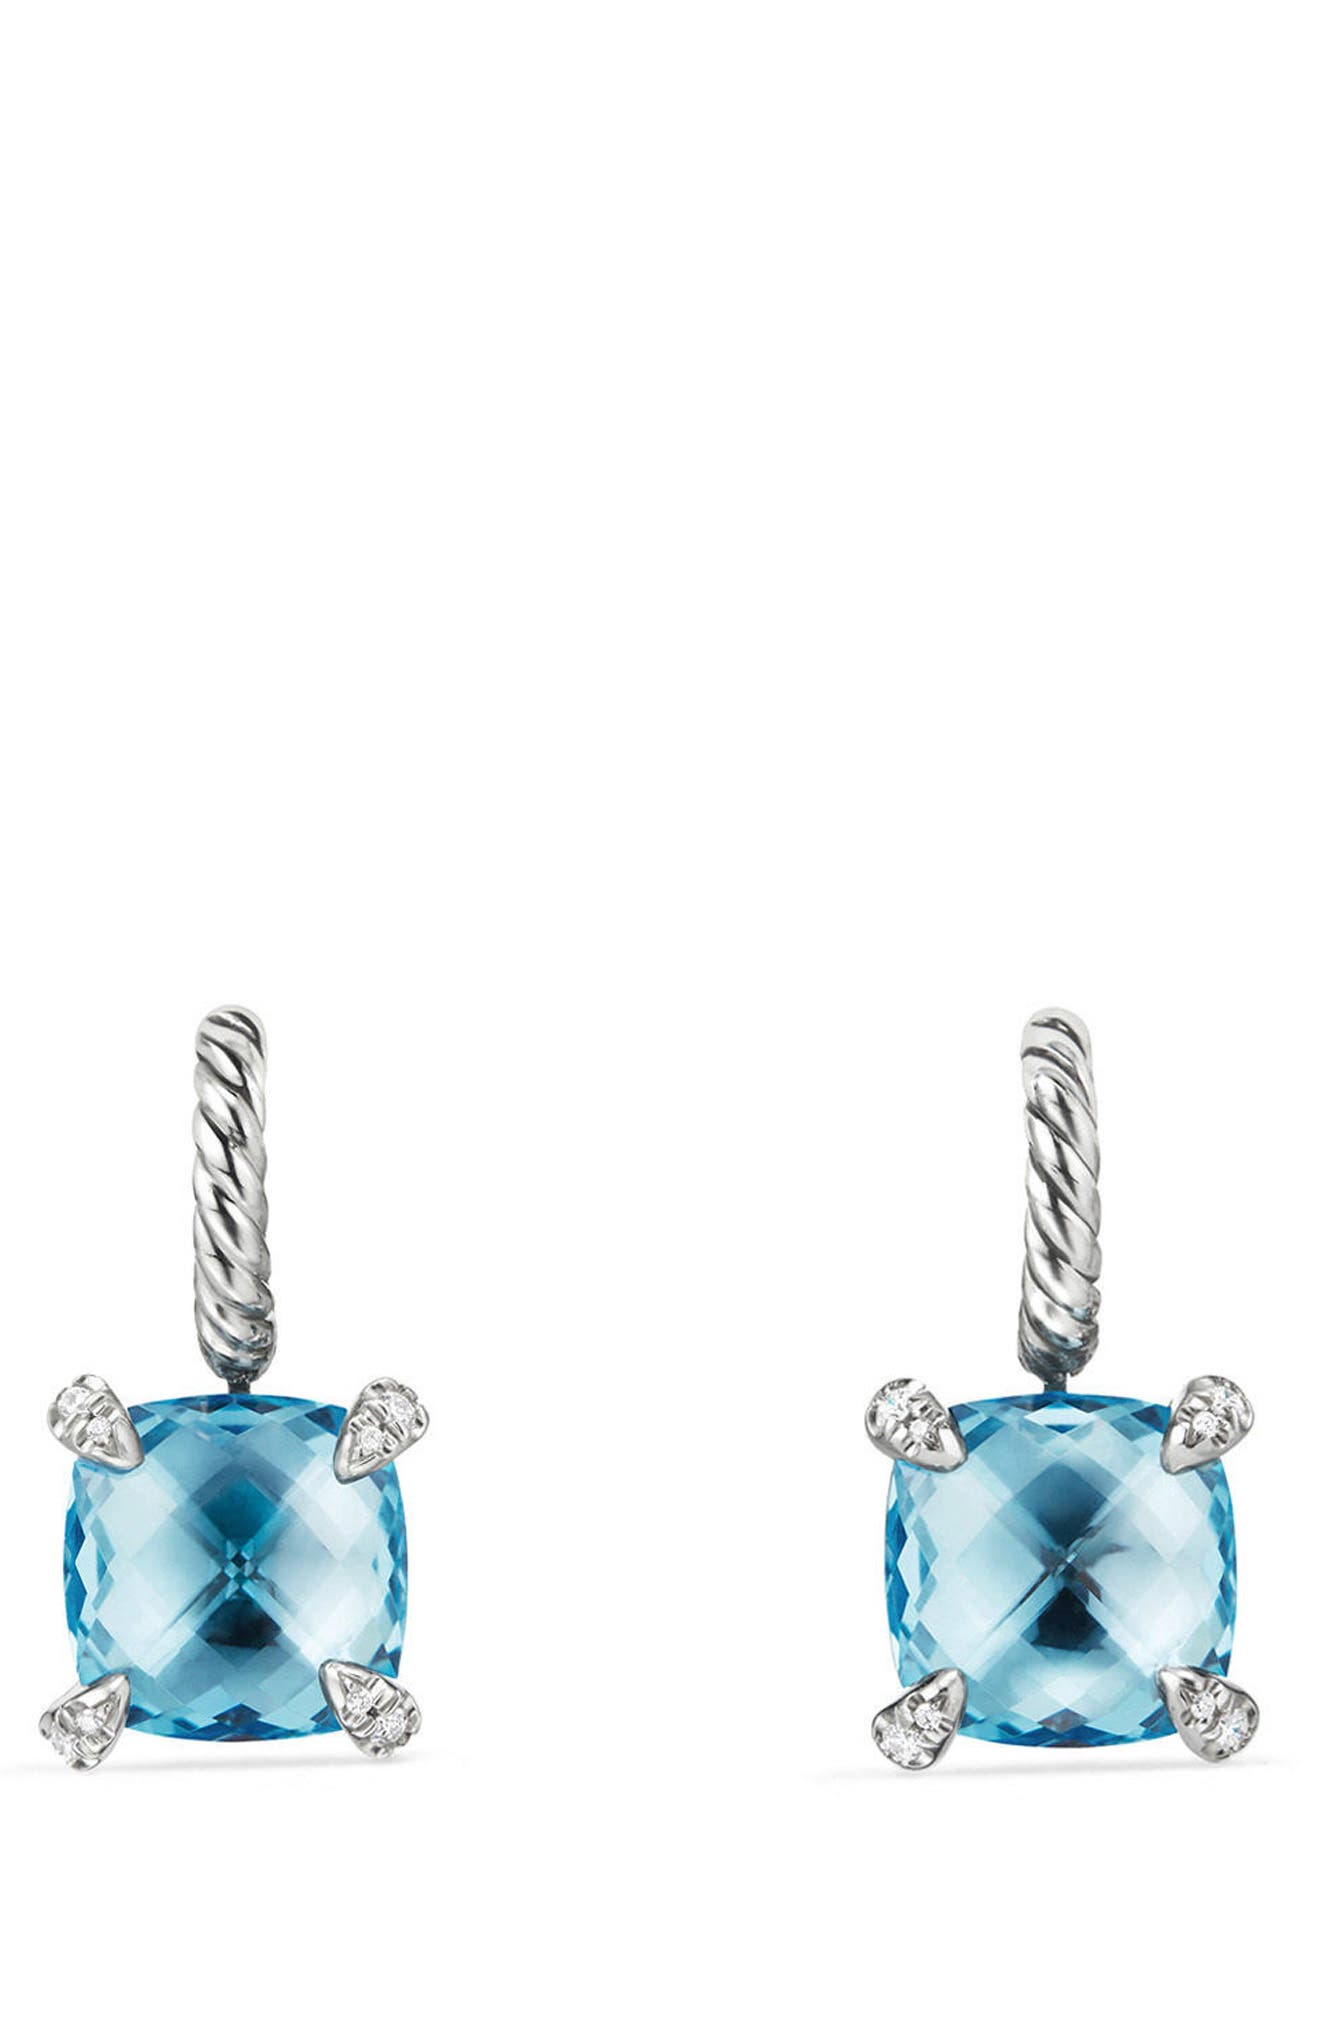 David Yurman Châtelaine Drop Earrings with Diamonds